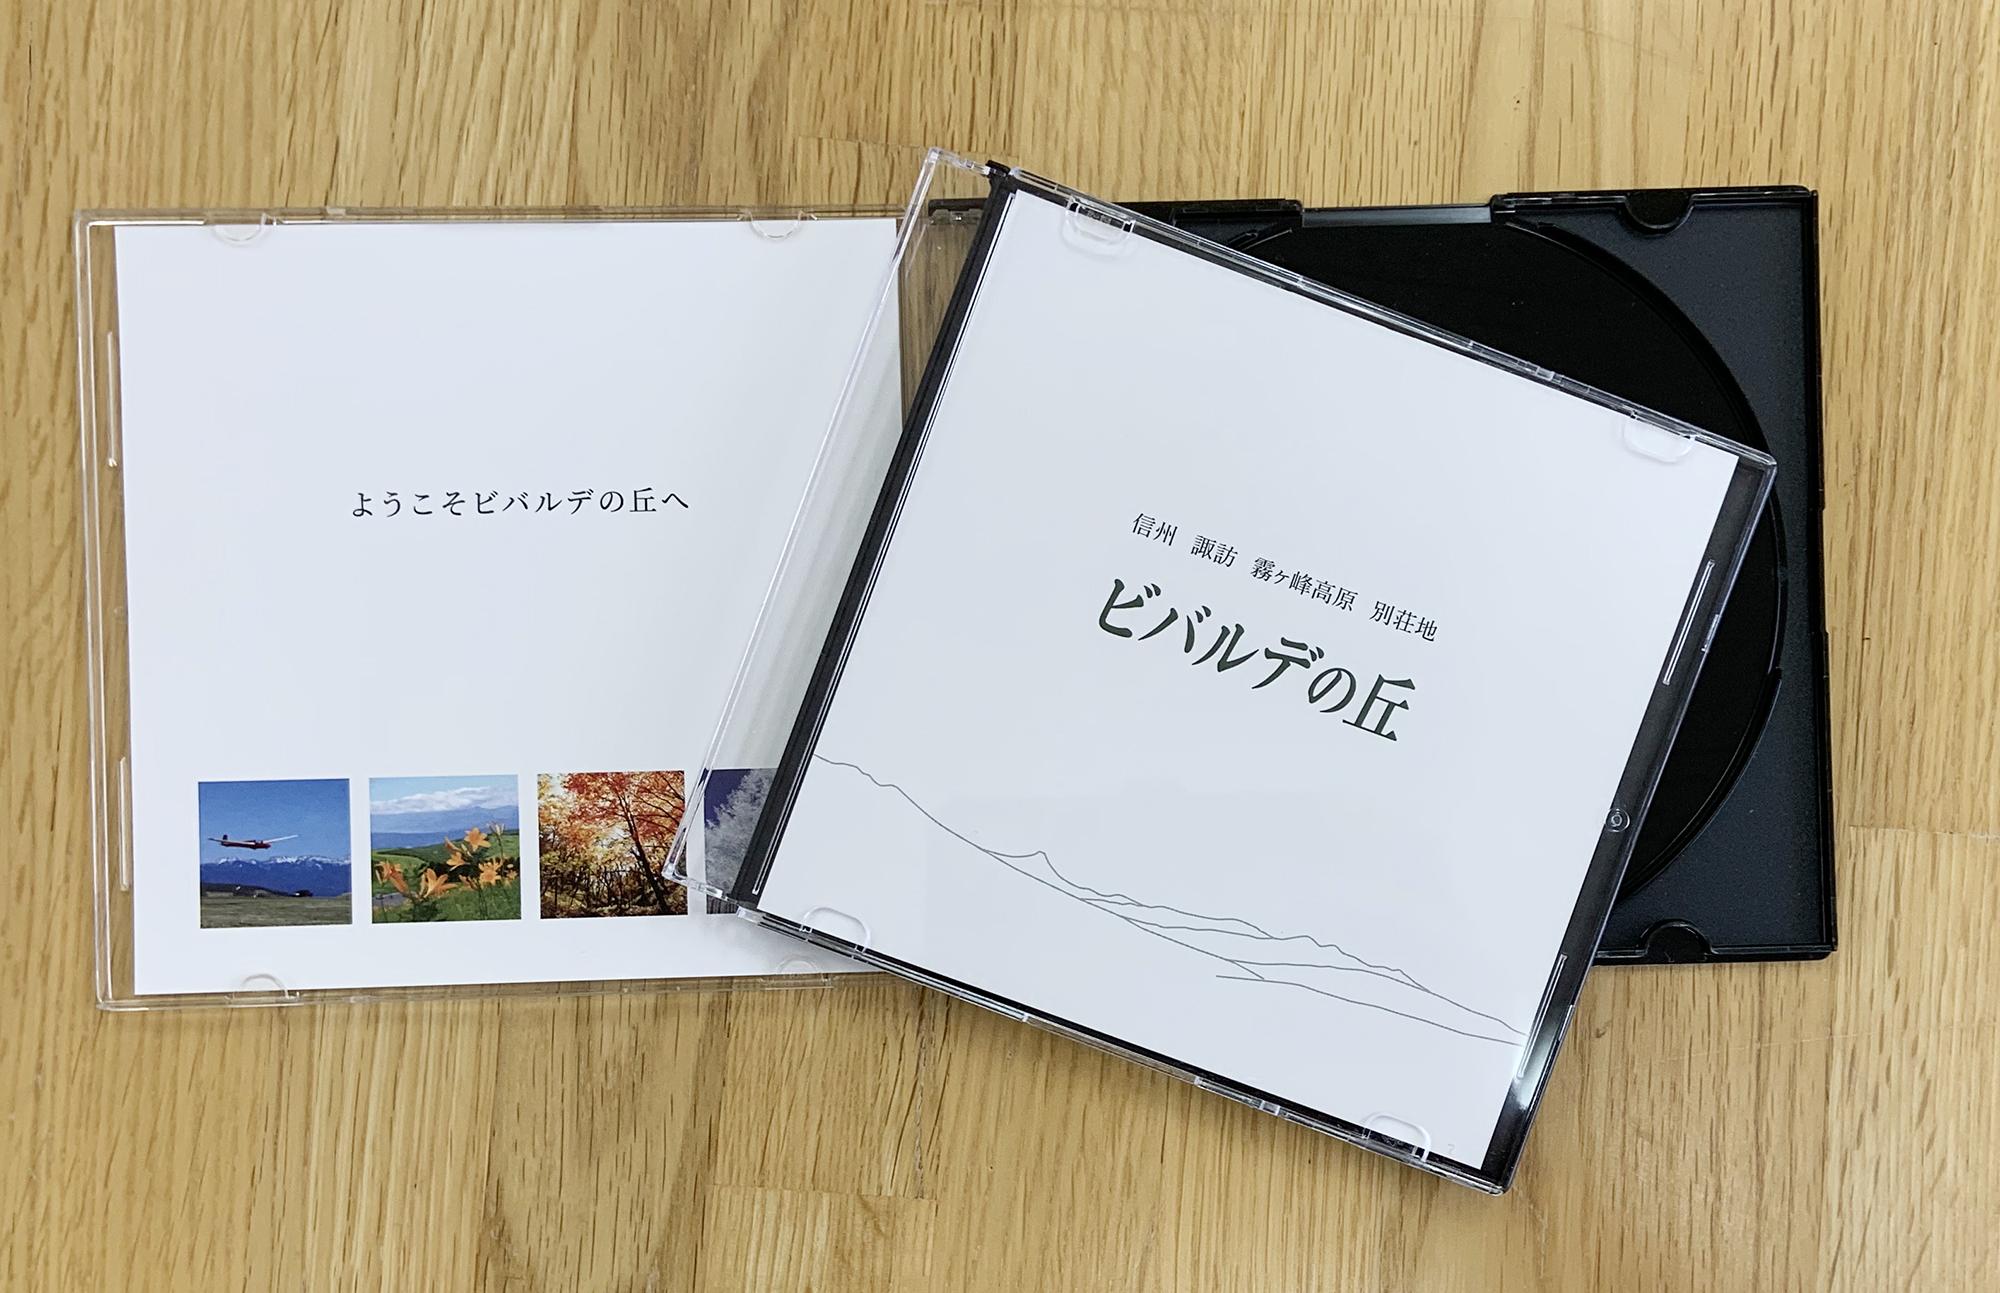 DVDジャケット(ビバルデの丘様)